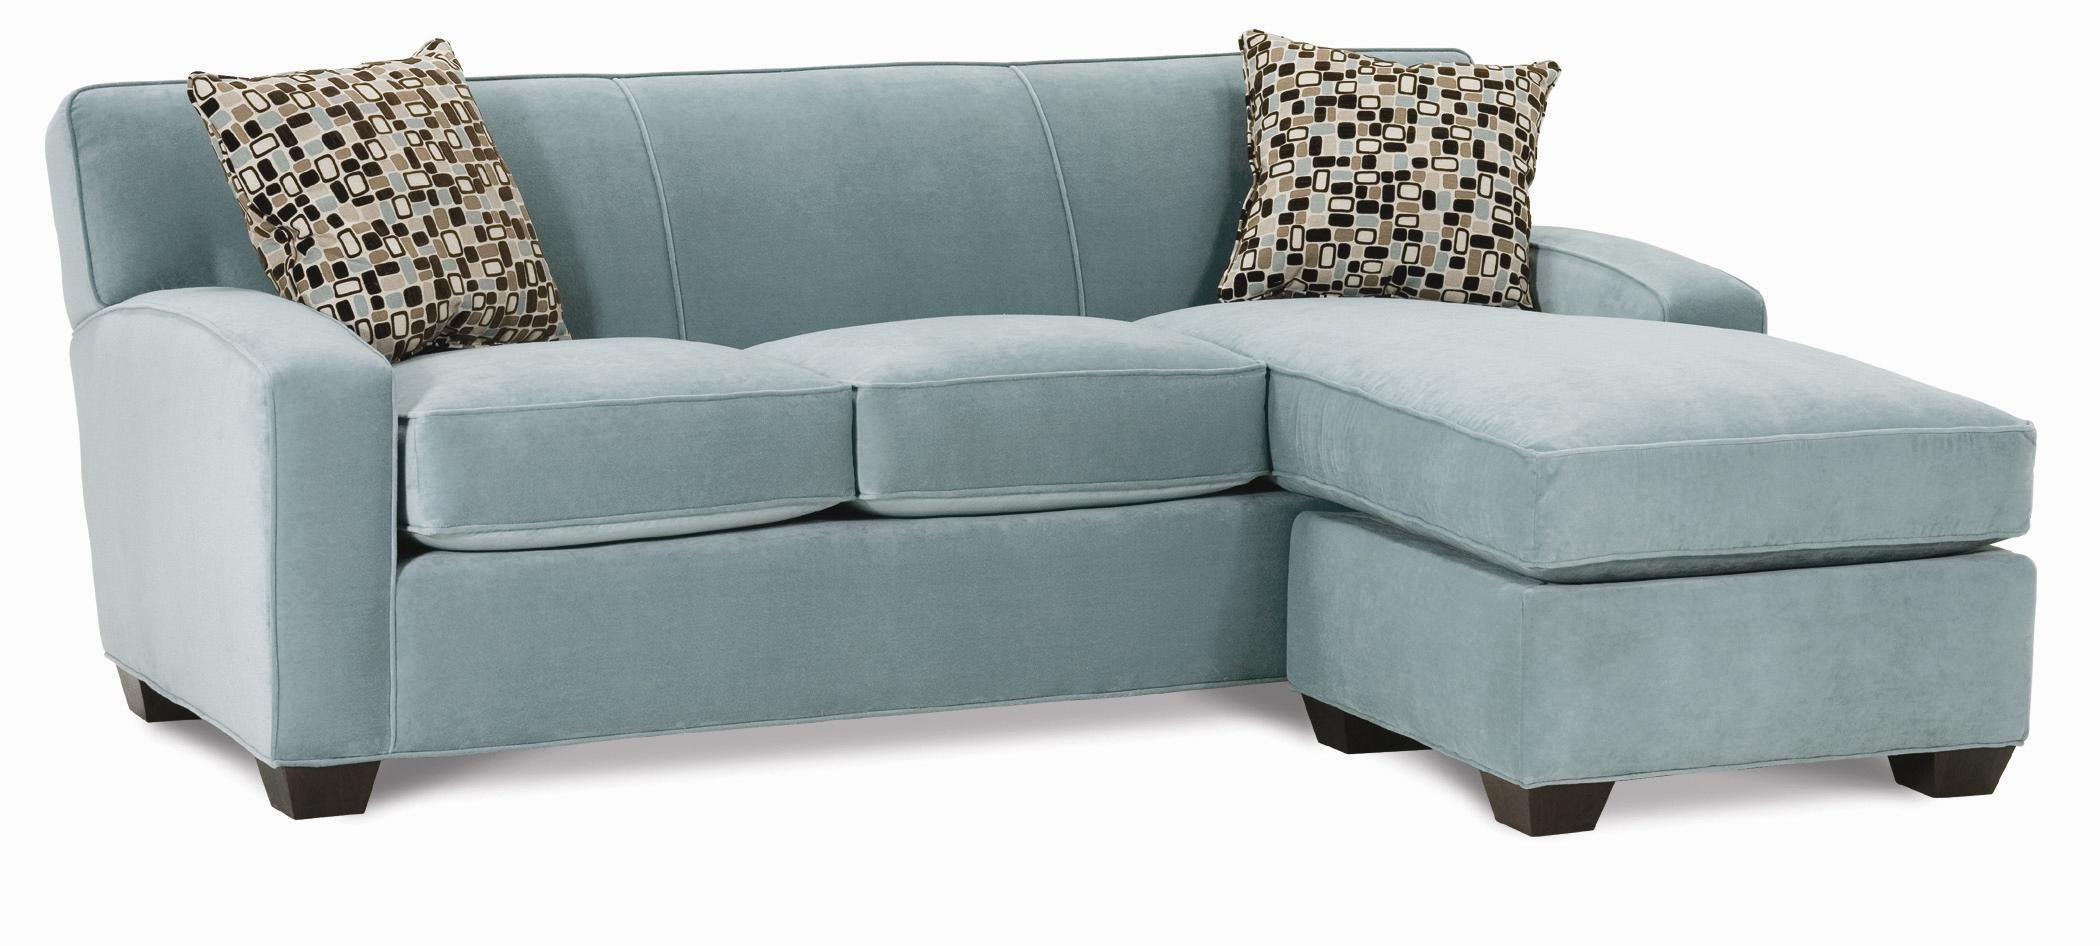 Horizon Stationary Sectional Sofa With Chaise By Rowe Ahfa Sofa Sectional Dealer Small Sectional Sleeper Sofa Sectional Sofa With Chaise Small Sleeper Sofa